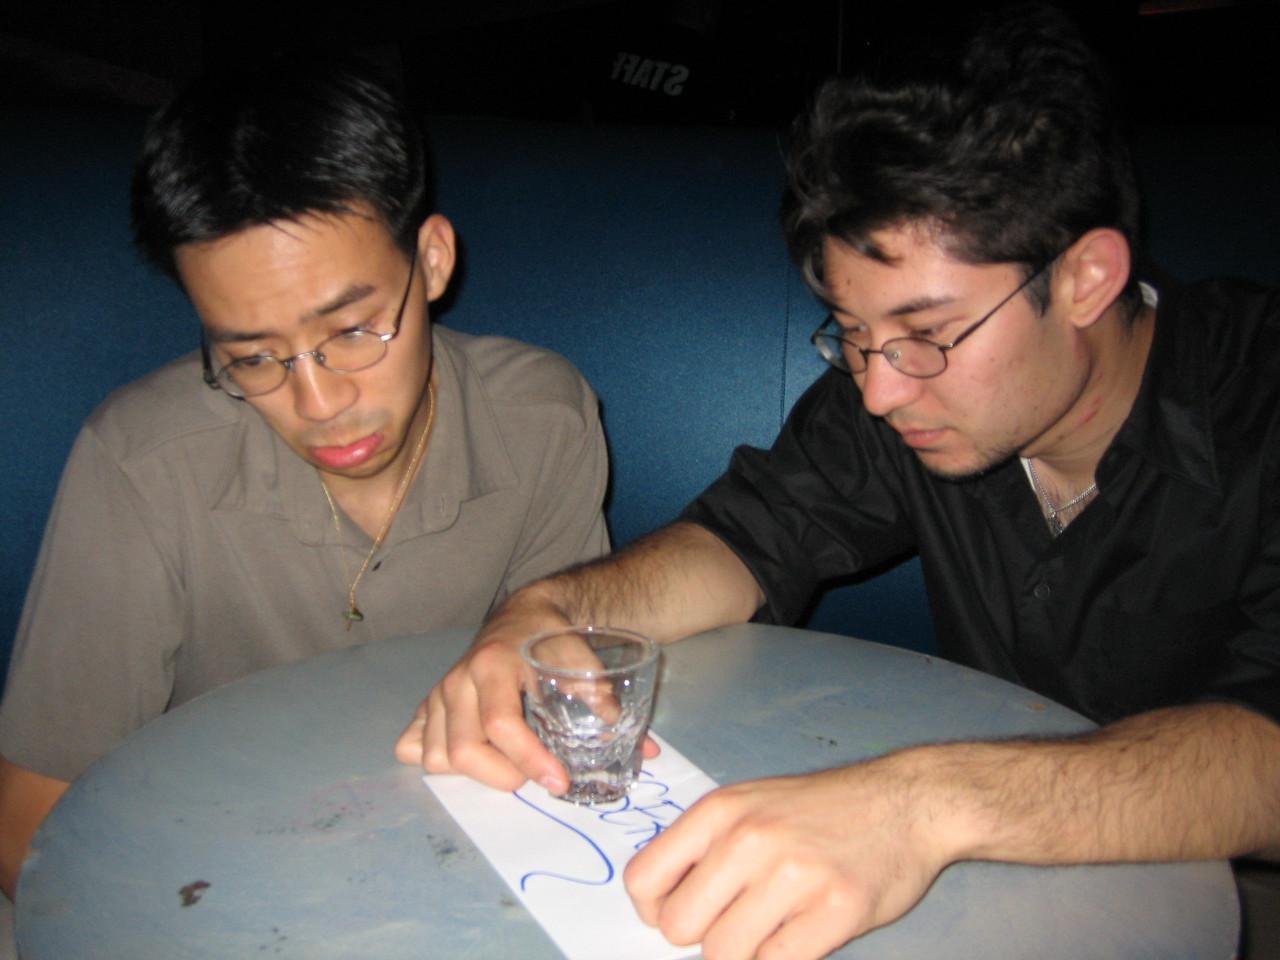 2005 06 04 Saturday - Velvet Lounge - Ben Yu & Kyle Lessler drowning their sorrows